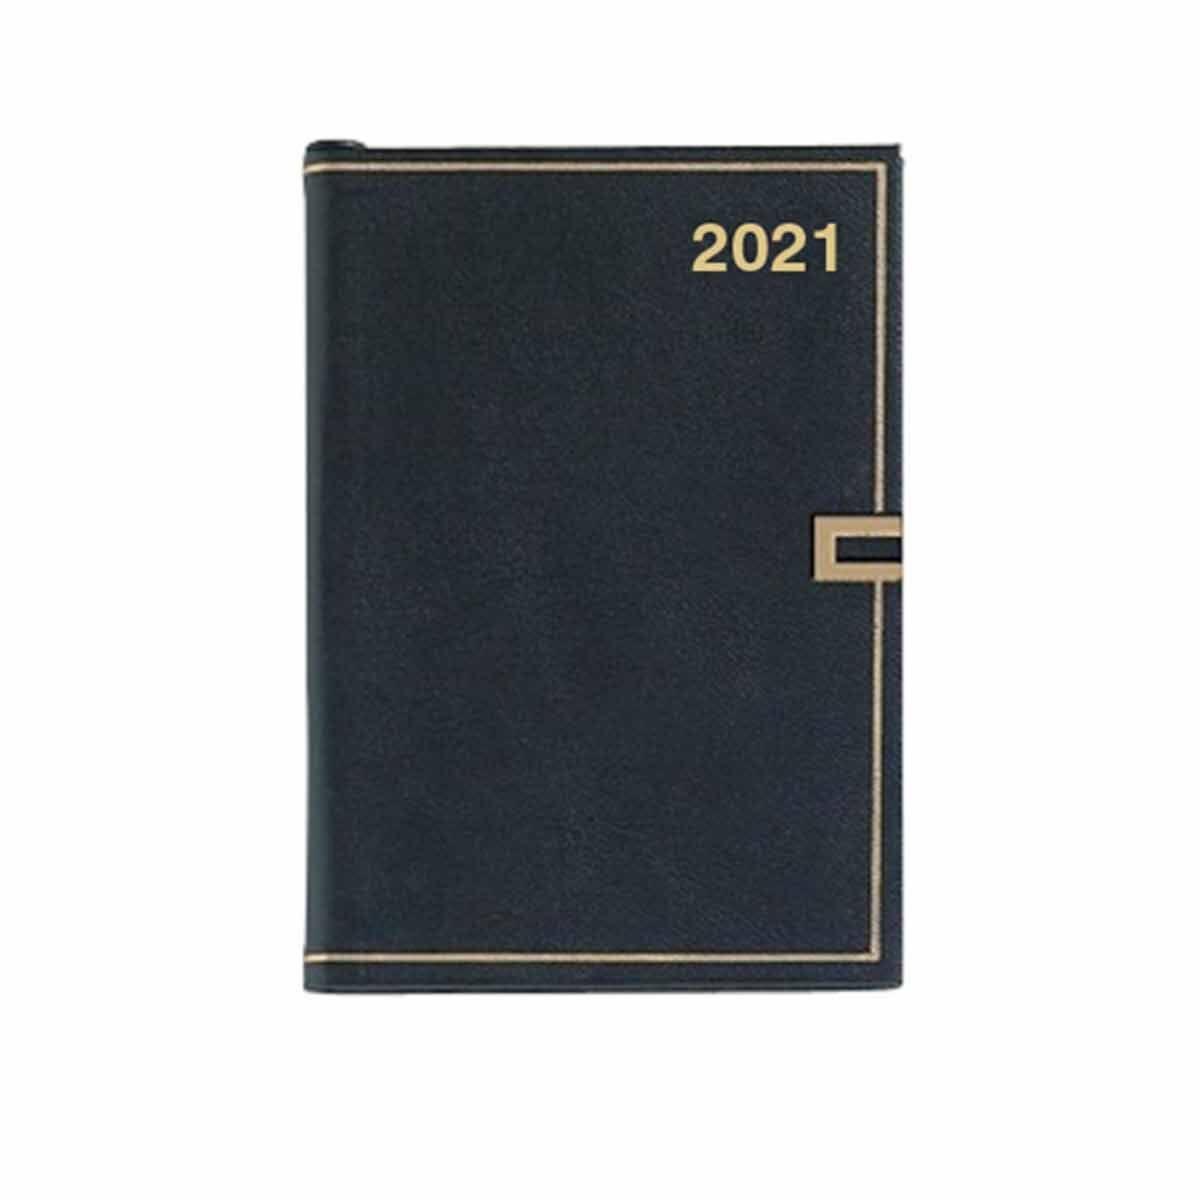 Dataday 3 Day per Page Pocket Diary 2021